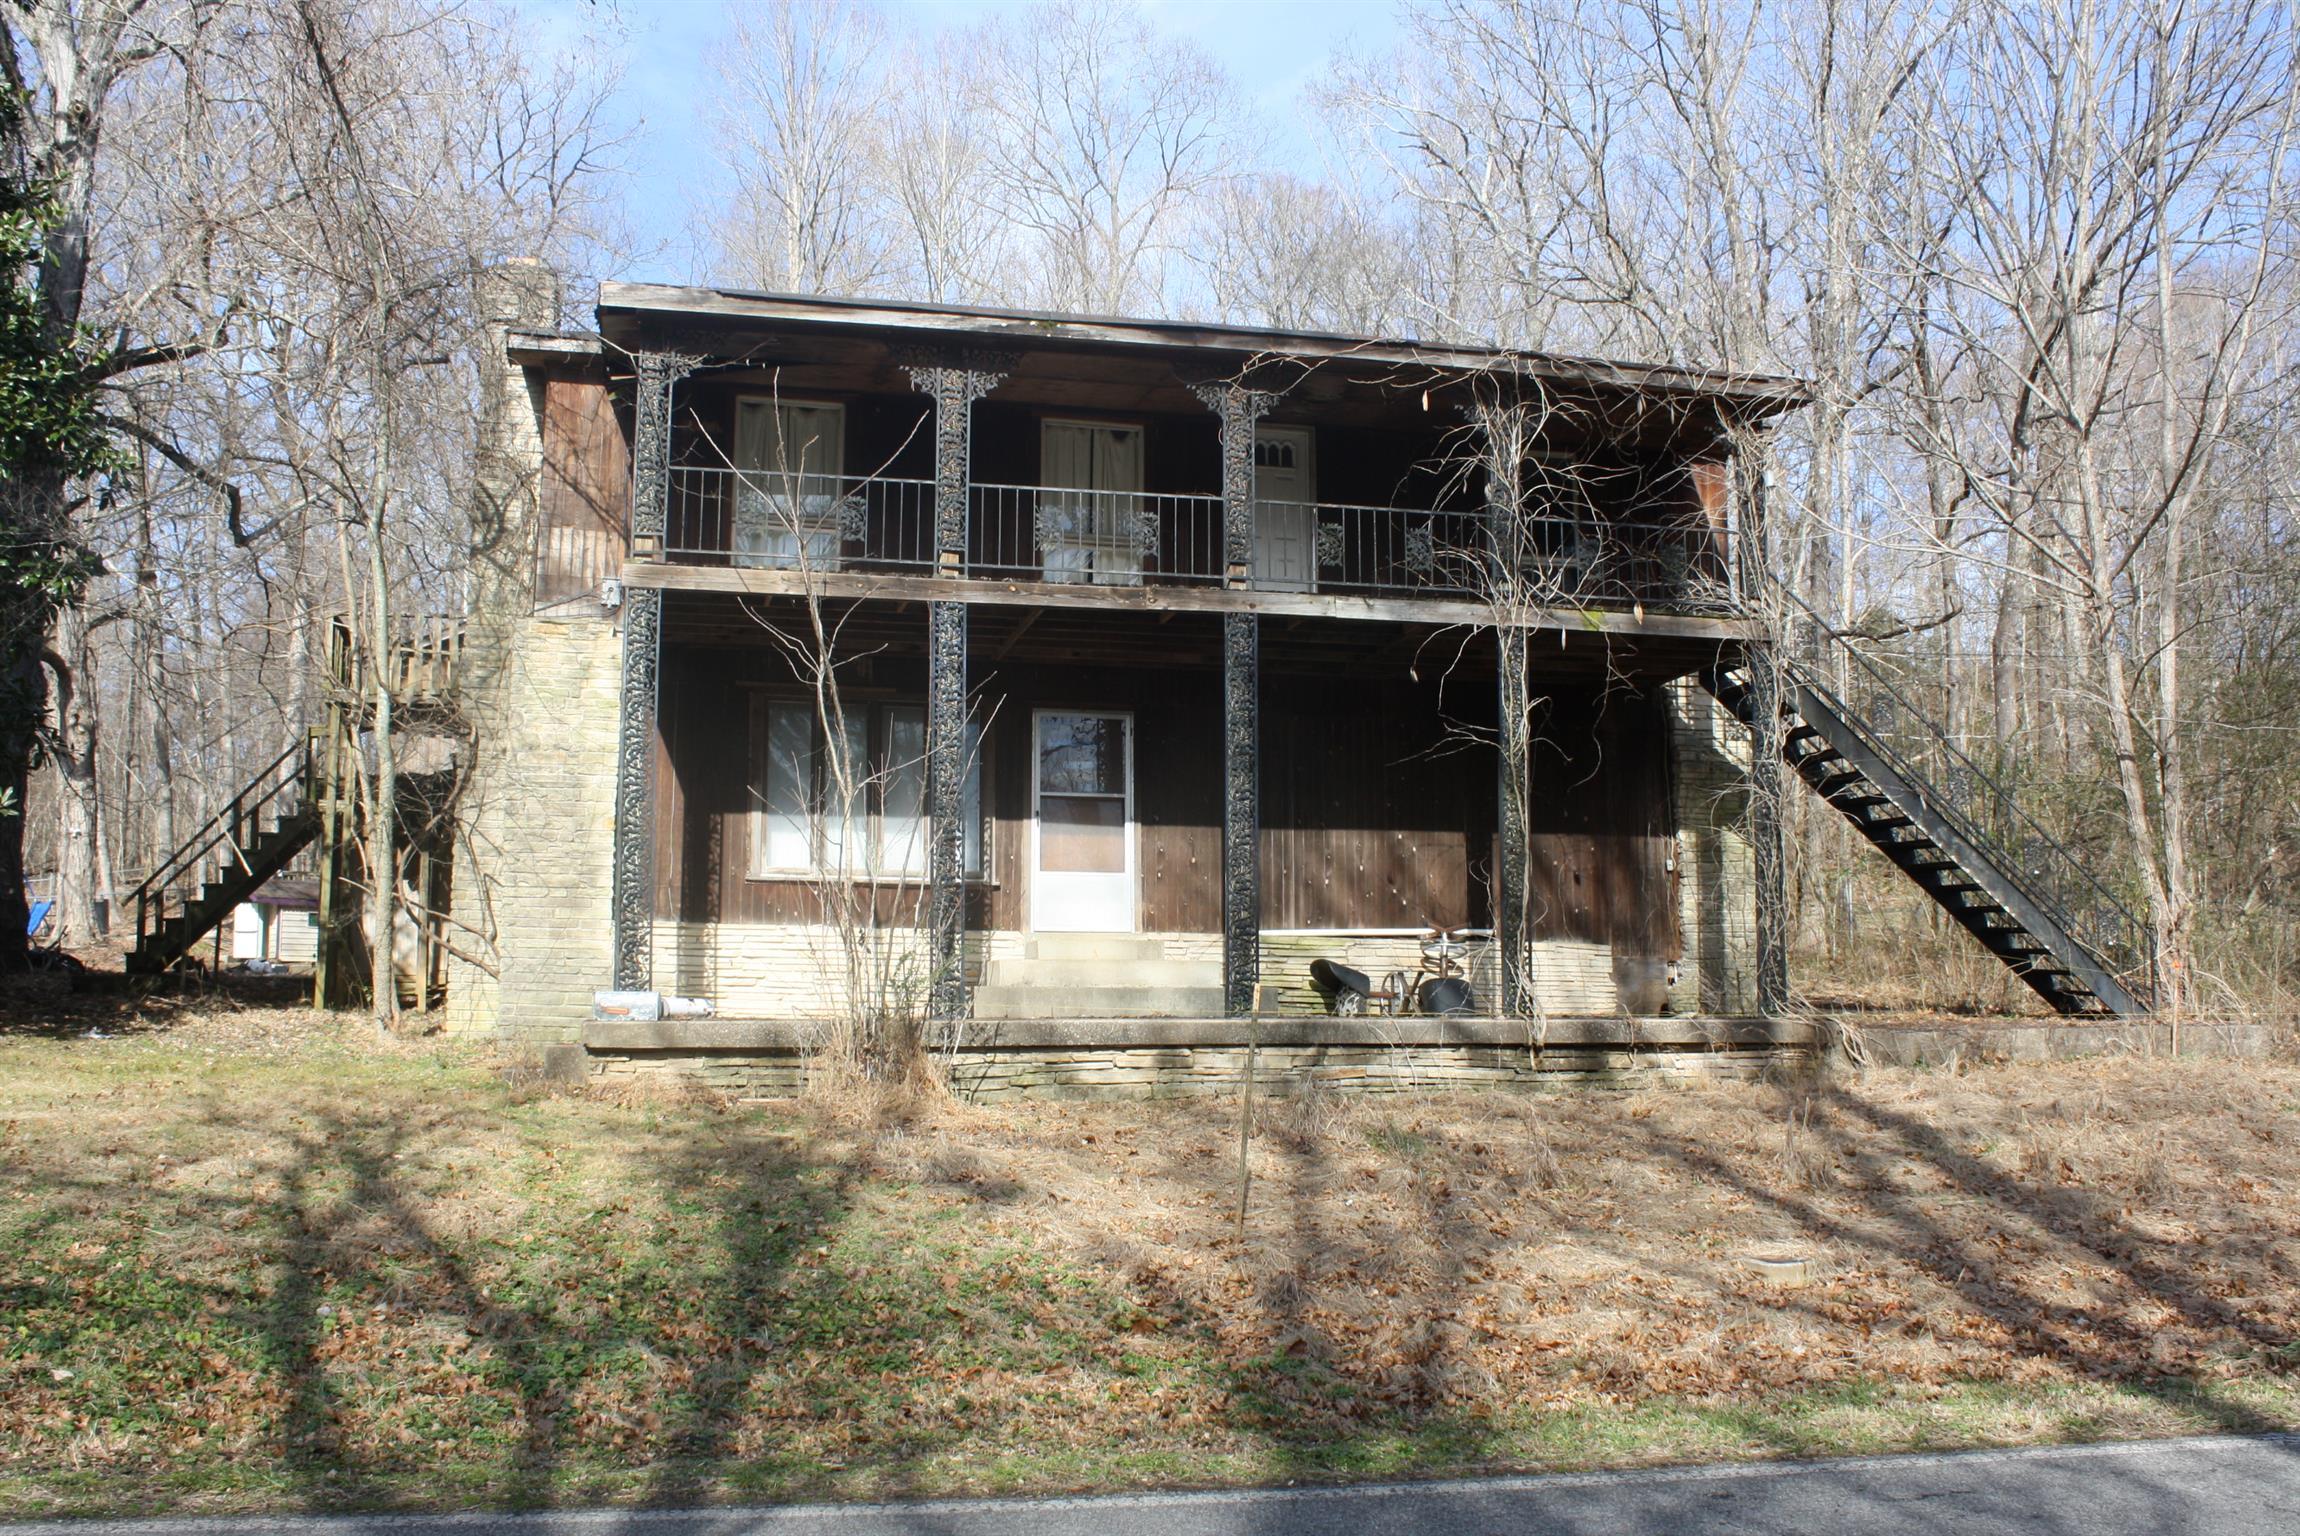 751 McAdoo Creek Rd, Clarksville, TN 37043 - Clarksville, TN real estate listing